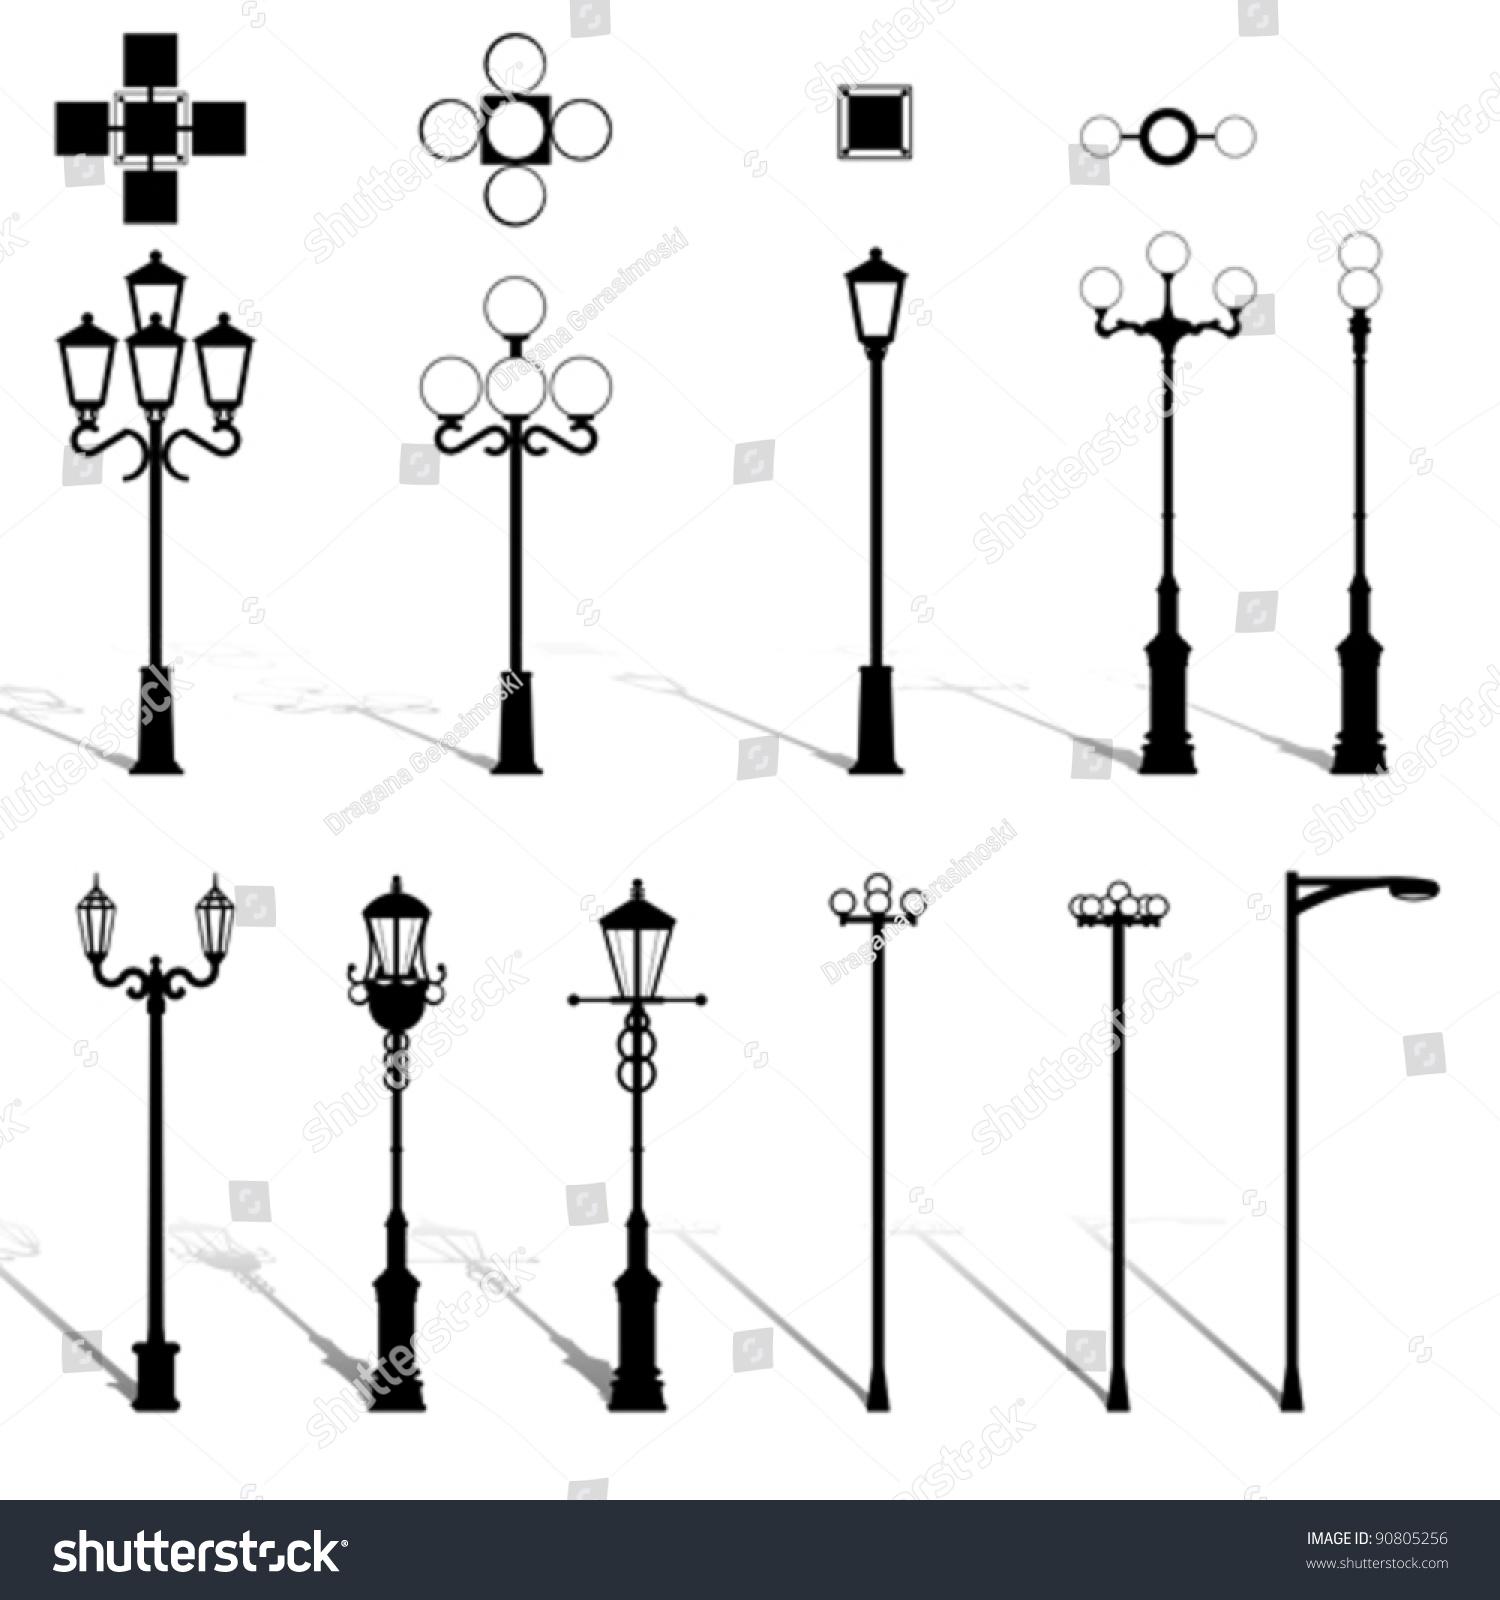 modern lightning outdoor lamp pole set stock vector 90805256 modern lightning outdoor lamp pole set architecture outdoor electric design equipment elements street light